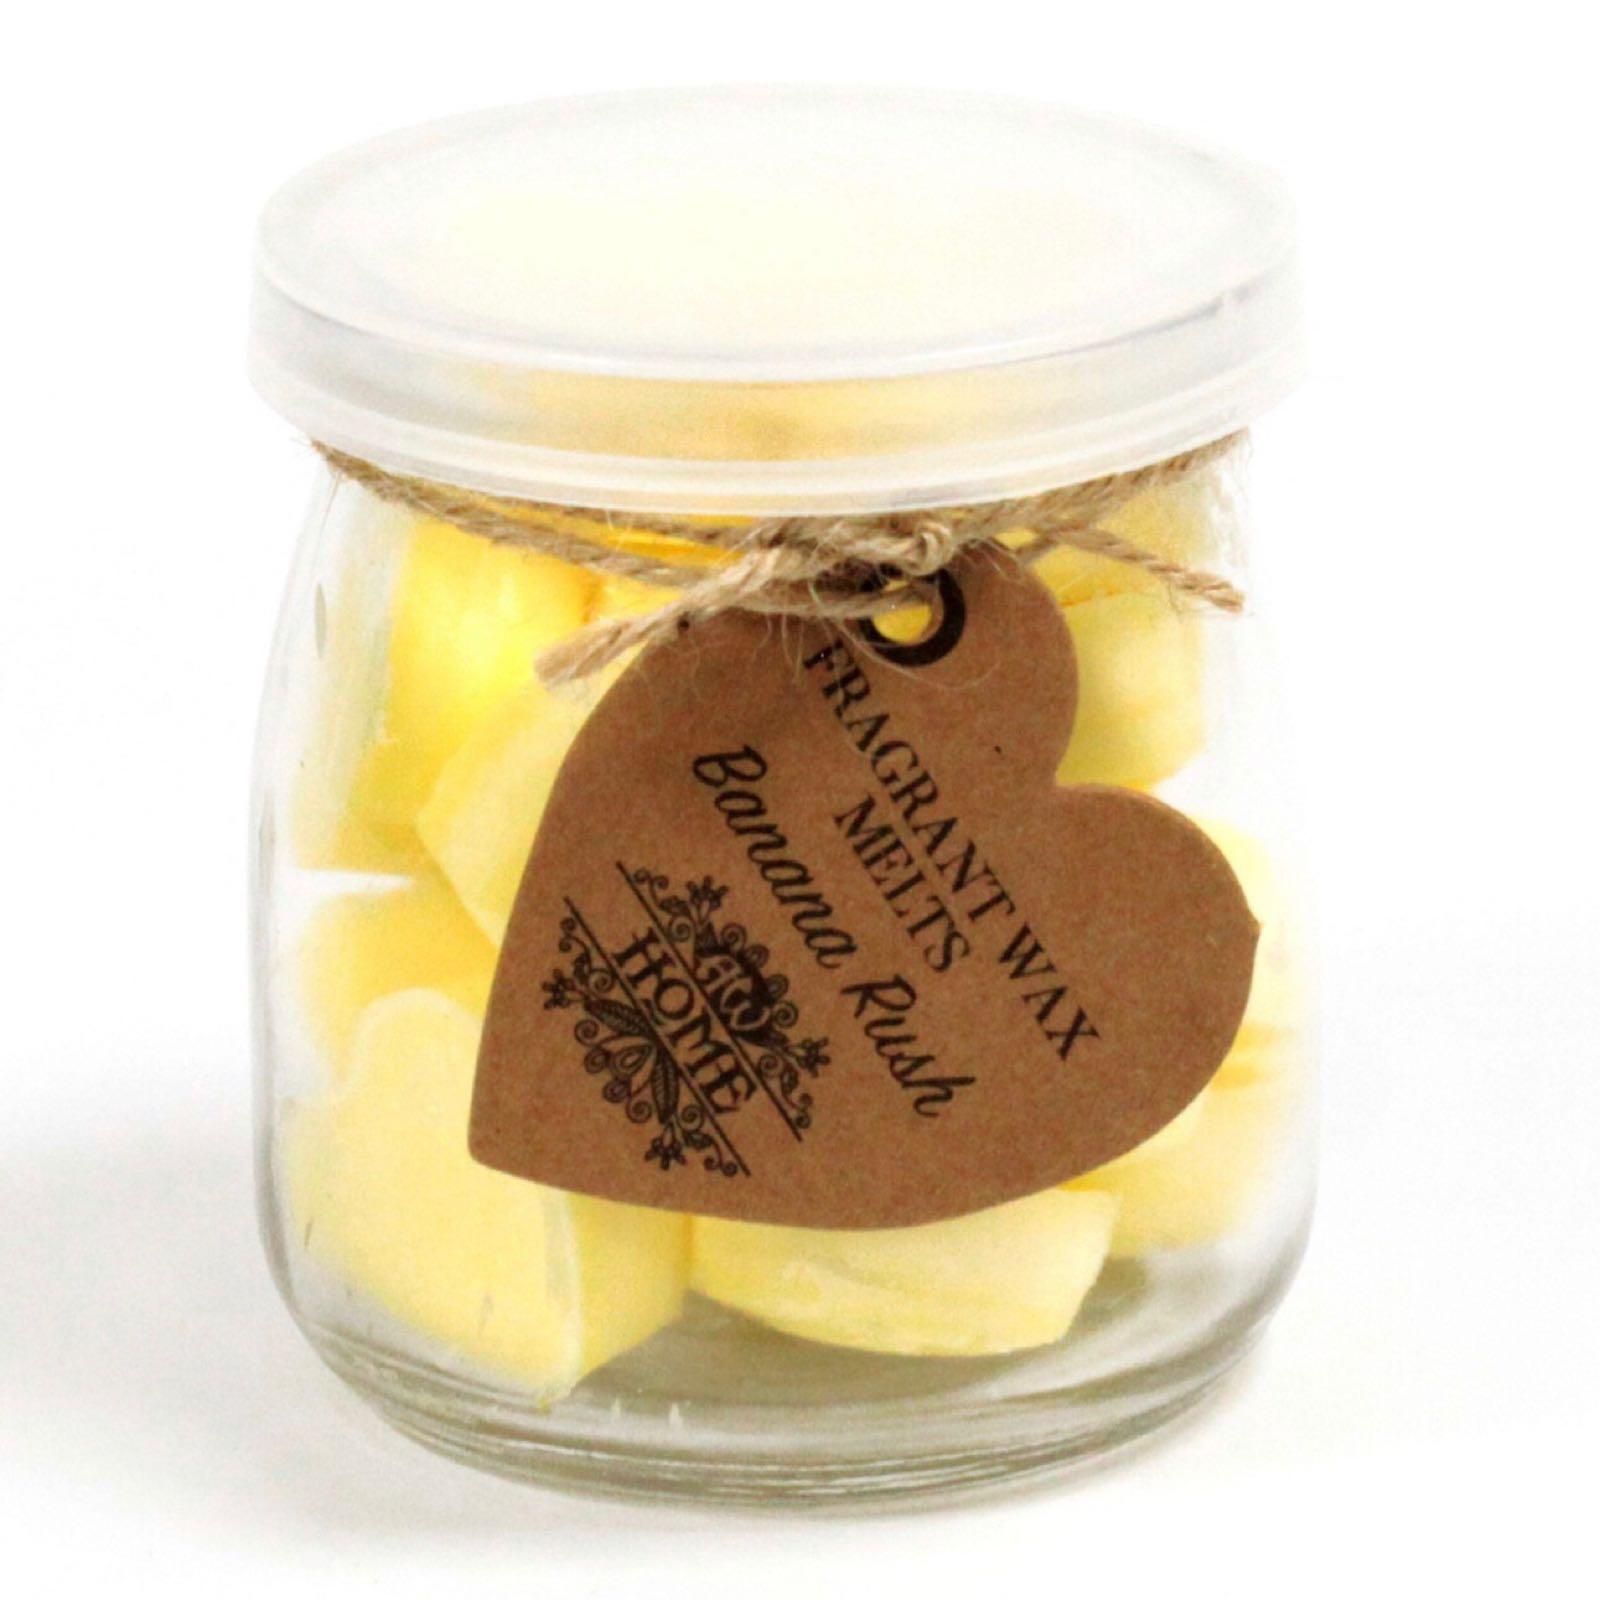 'Banana Rush' Wax Melts Jar (Was £6.50)